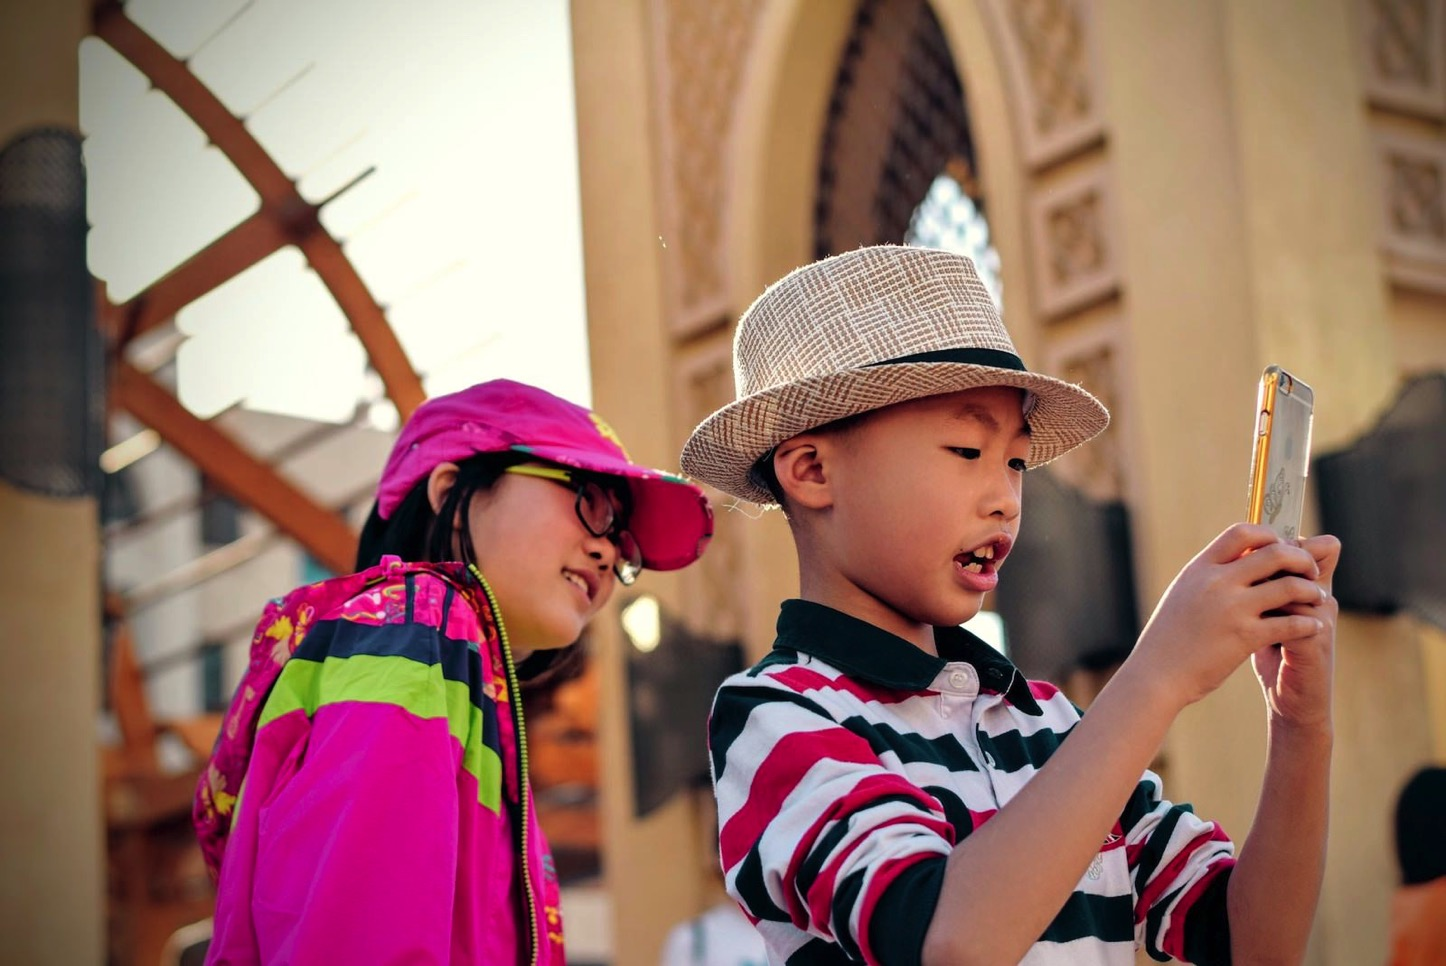 tim-gouw-75989-kids-using-iphone-unsplash.jpg